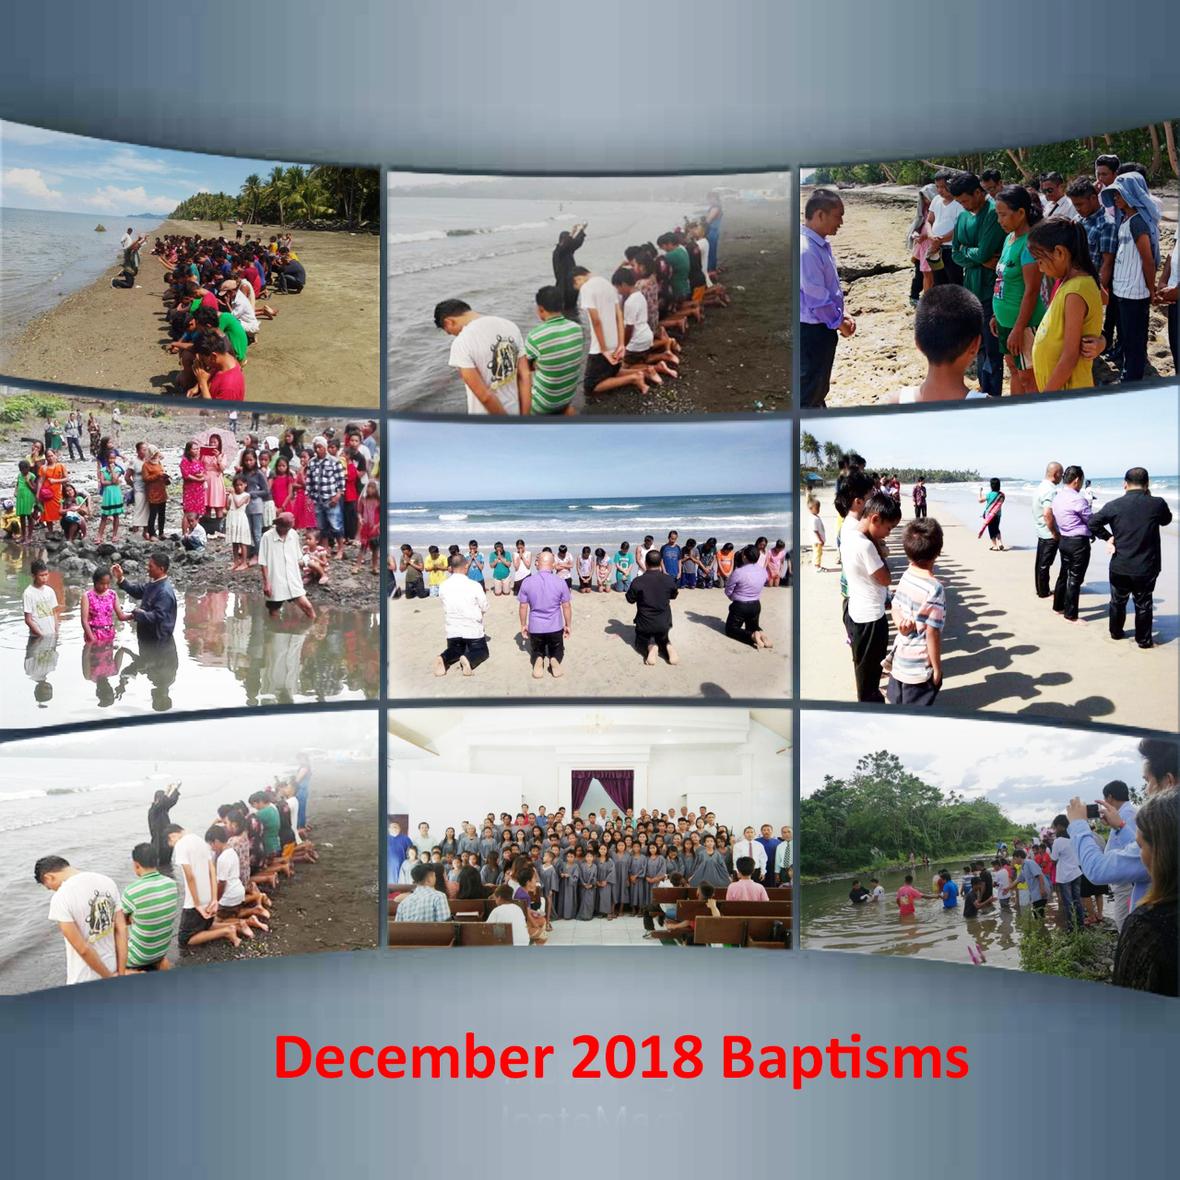 889 were baptized in December 2018